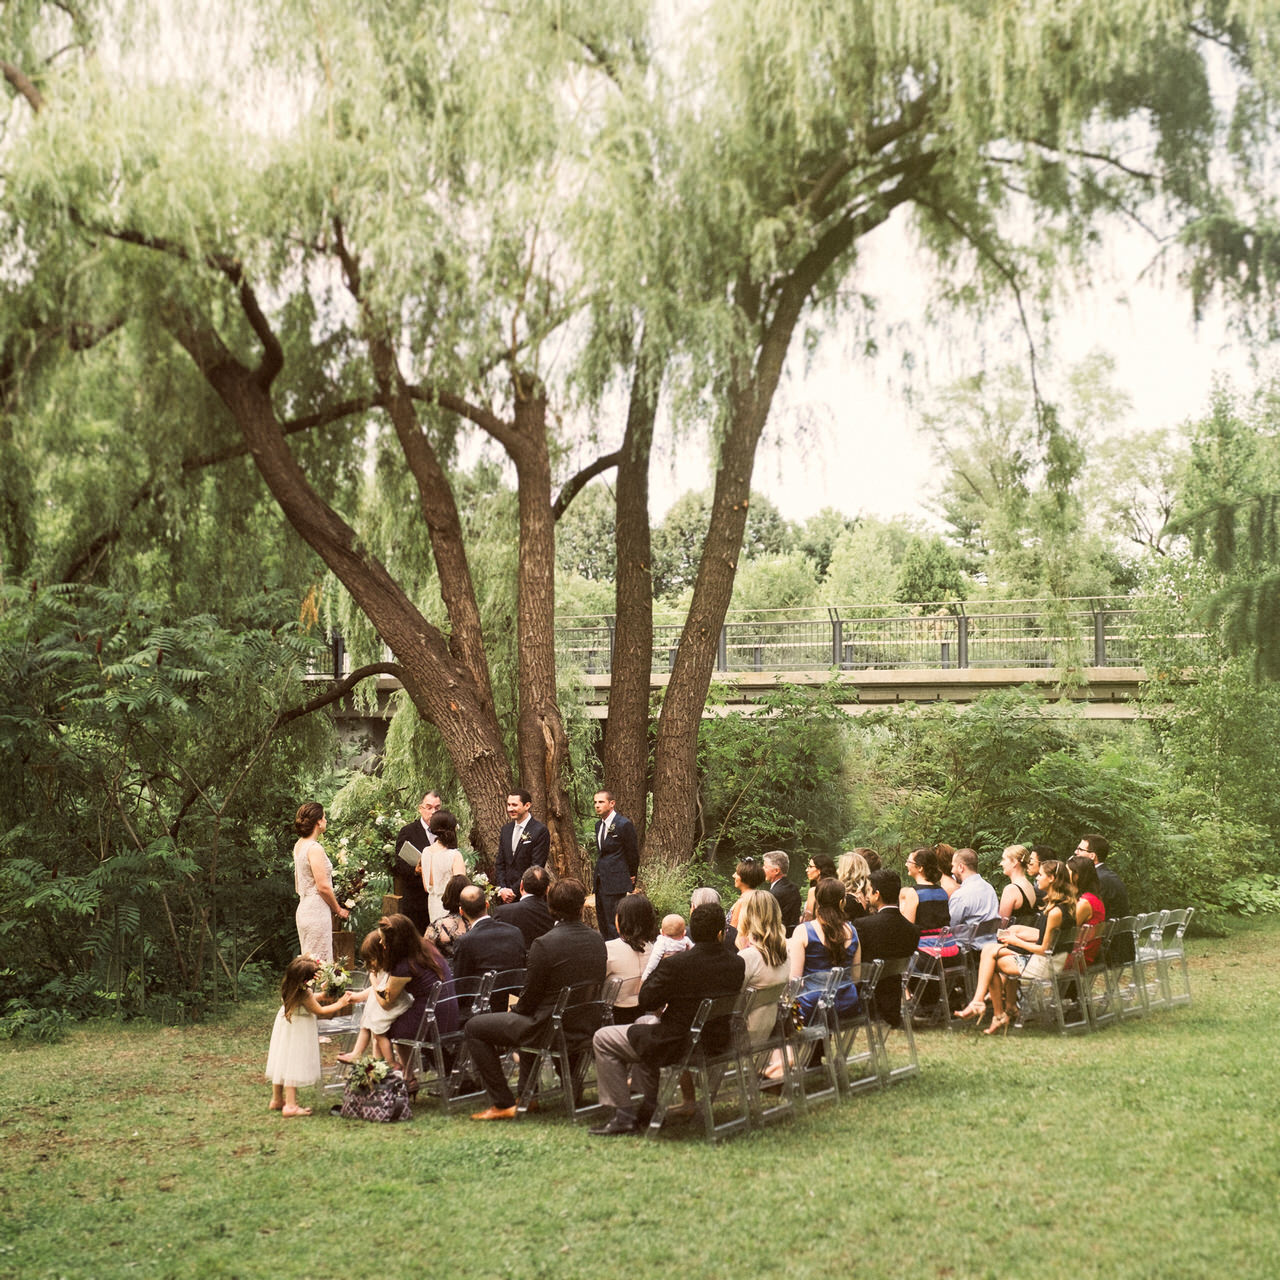 Montreal Wedding photography at Parc Jean-Drapeau